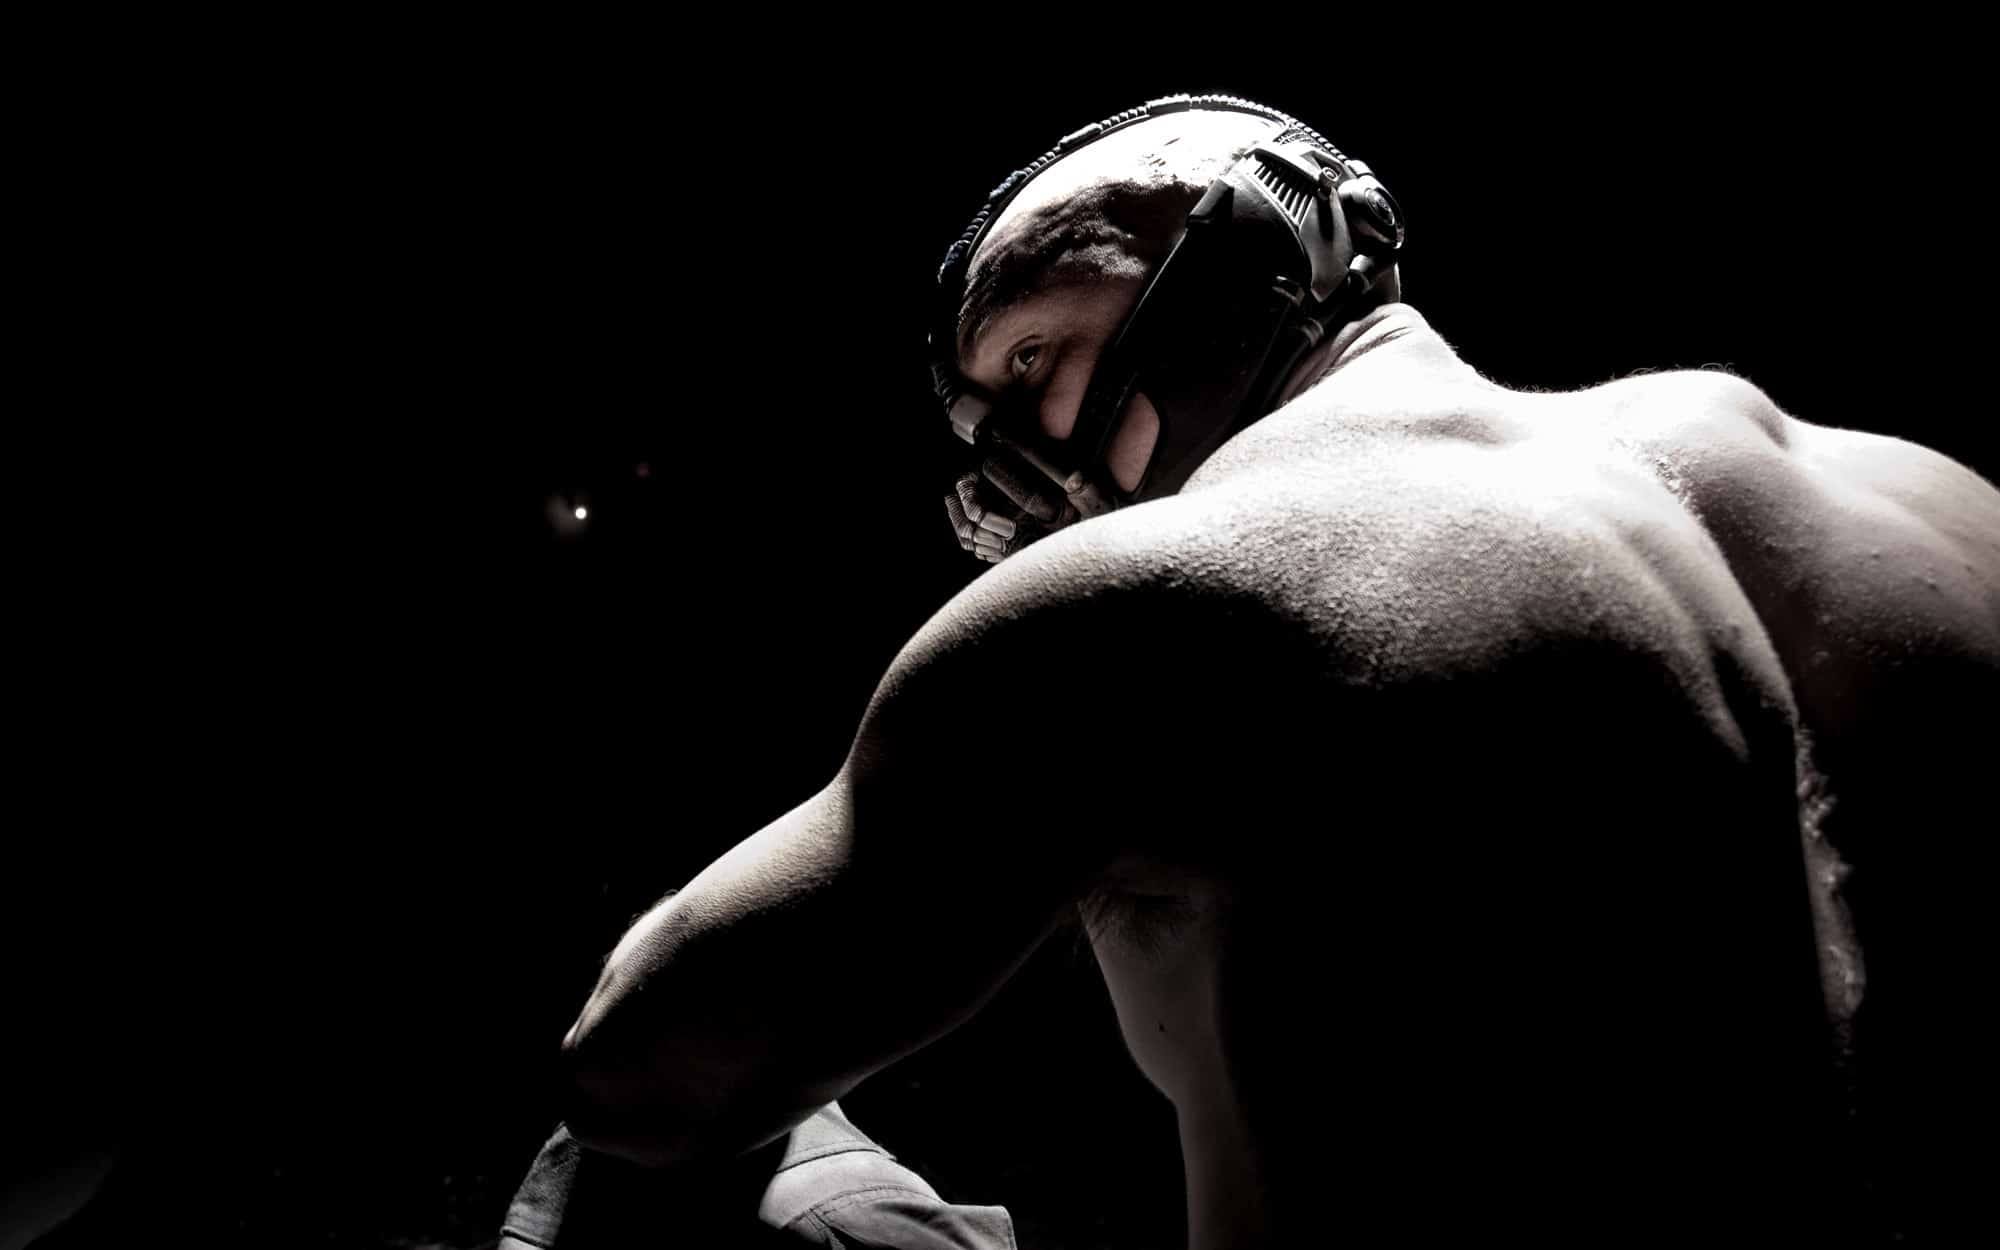 The-Dark-Knight-Rises-Photo-Promo-01-Bane